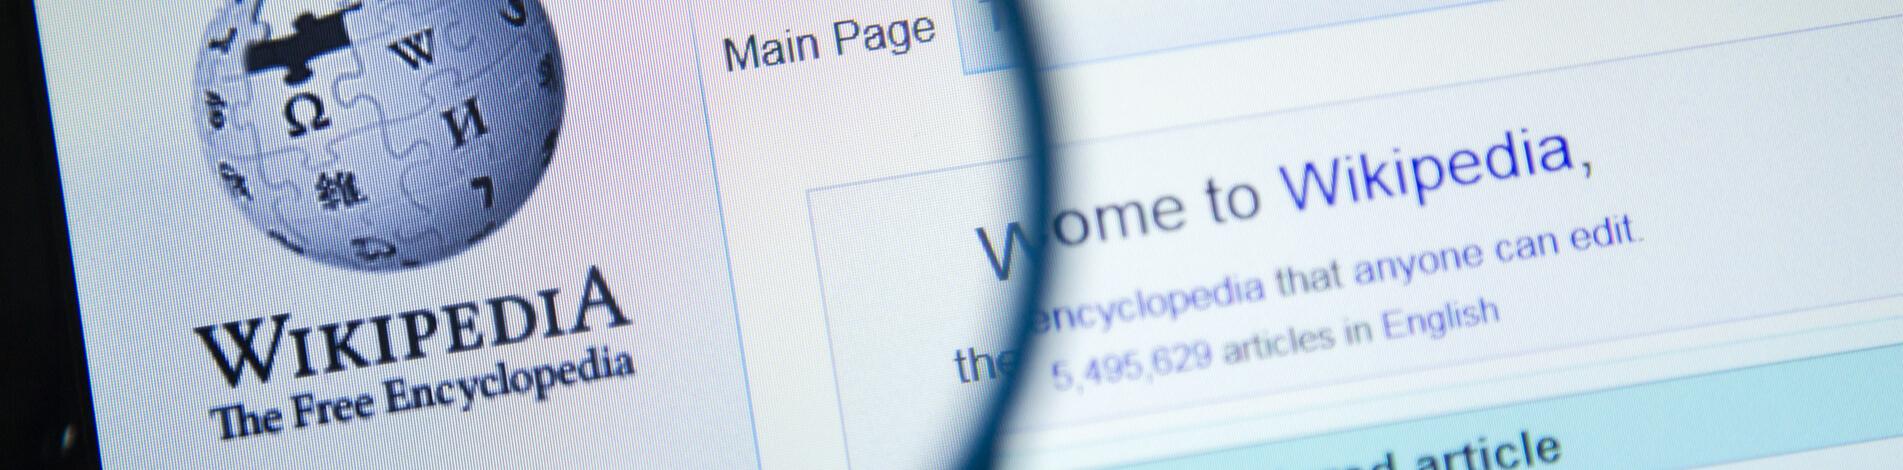 Aangetekende E-mail Goes Wikipedia!